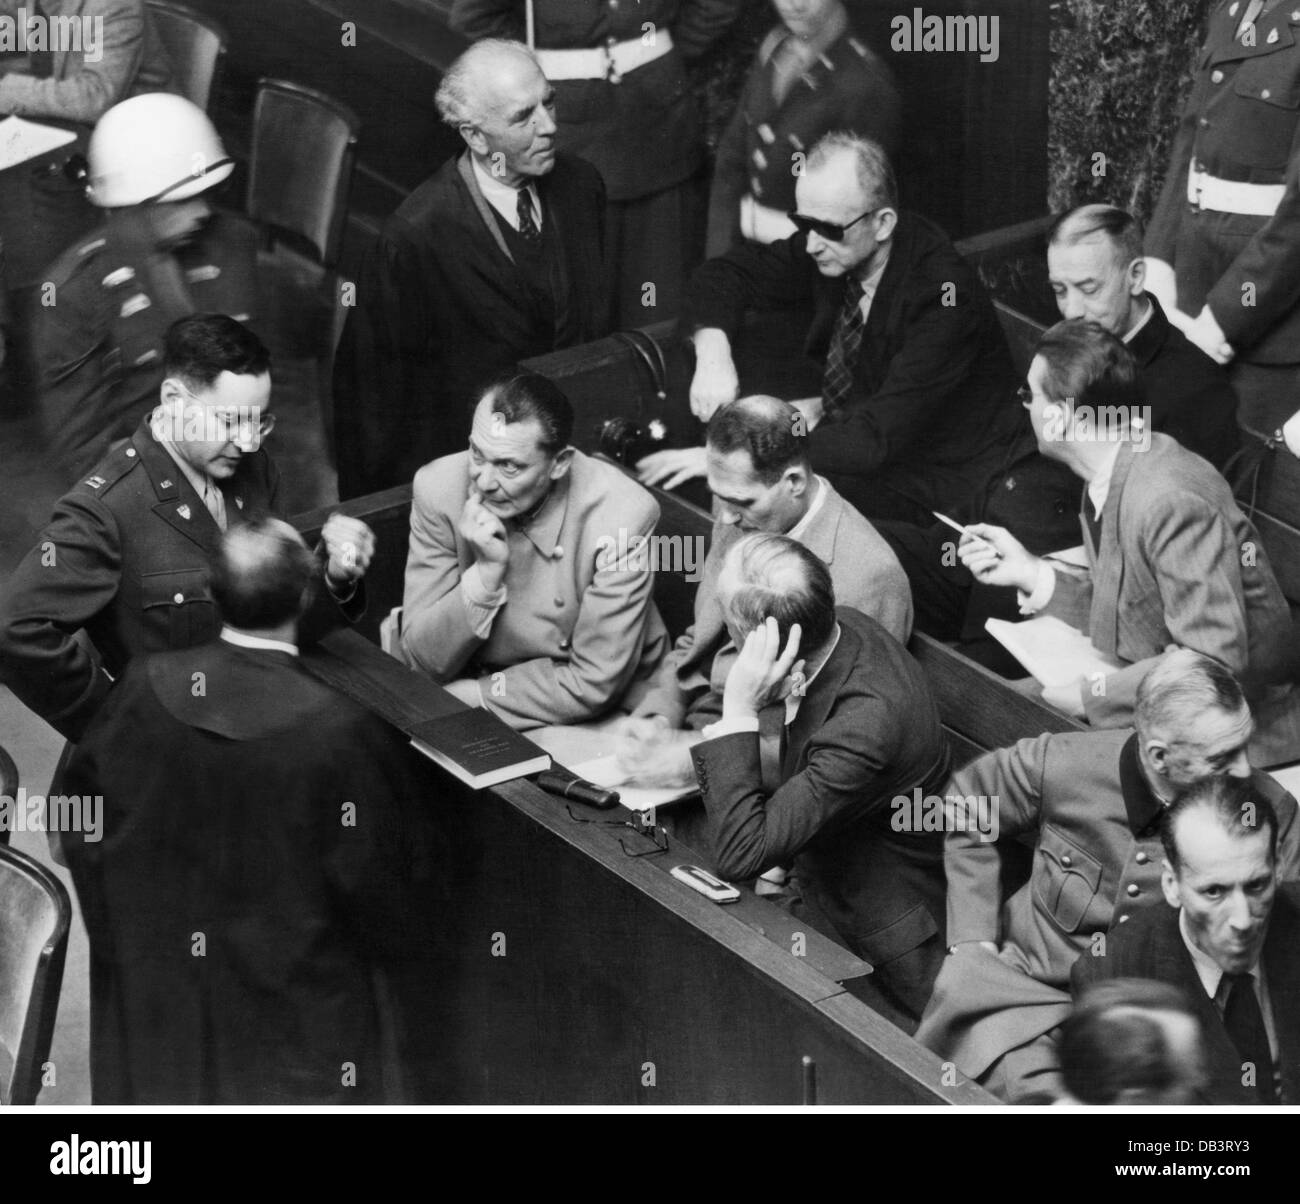 justice, lawsuits, Nuremberg Trials, trial against the major war criminals, psychologist Gustave M. Gilbert in conversation - Stock Image